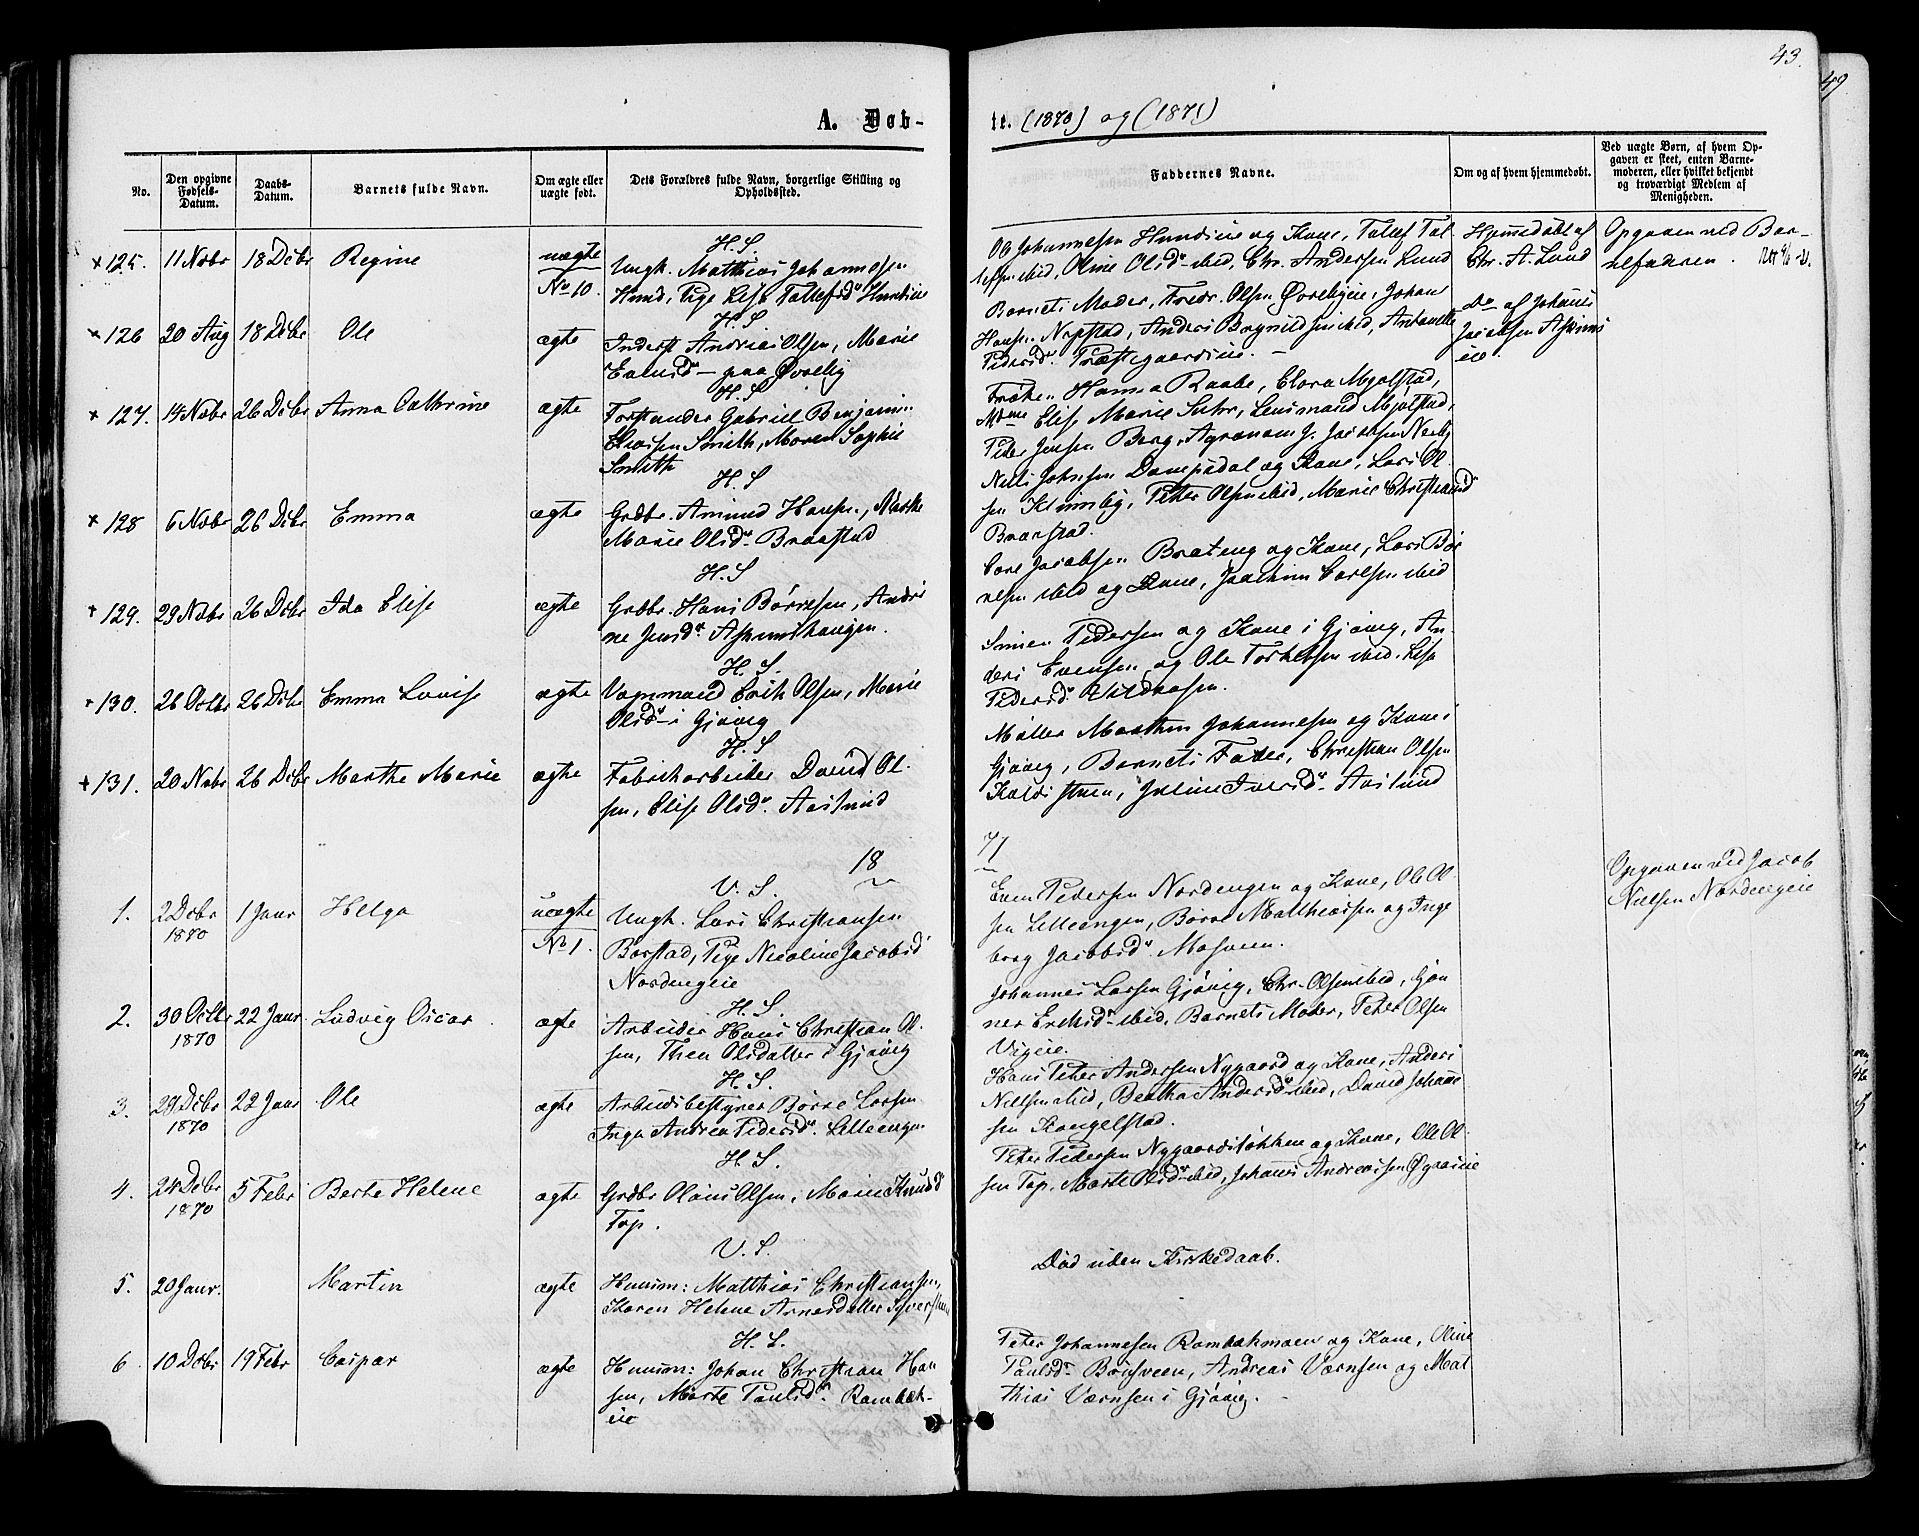 SAH, Vardal prestekontor, H/Ha/Haa/L0007: Ministerialbok nr. 7, 1867-1878, s. 43